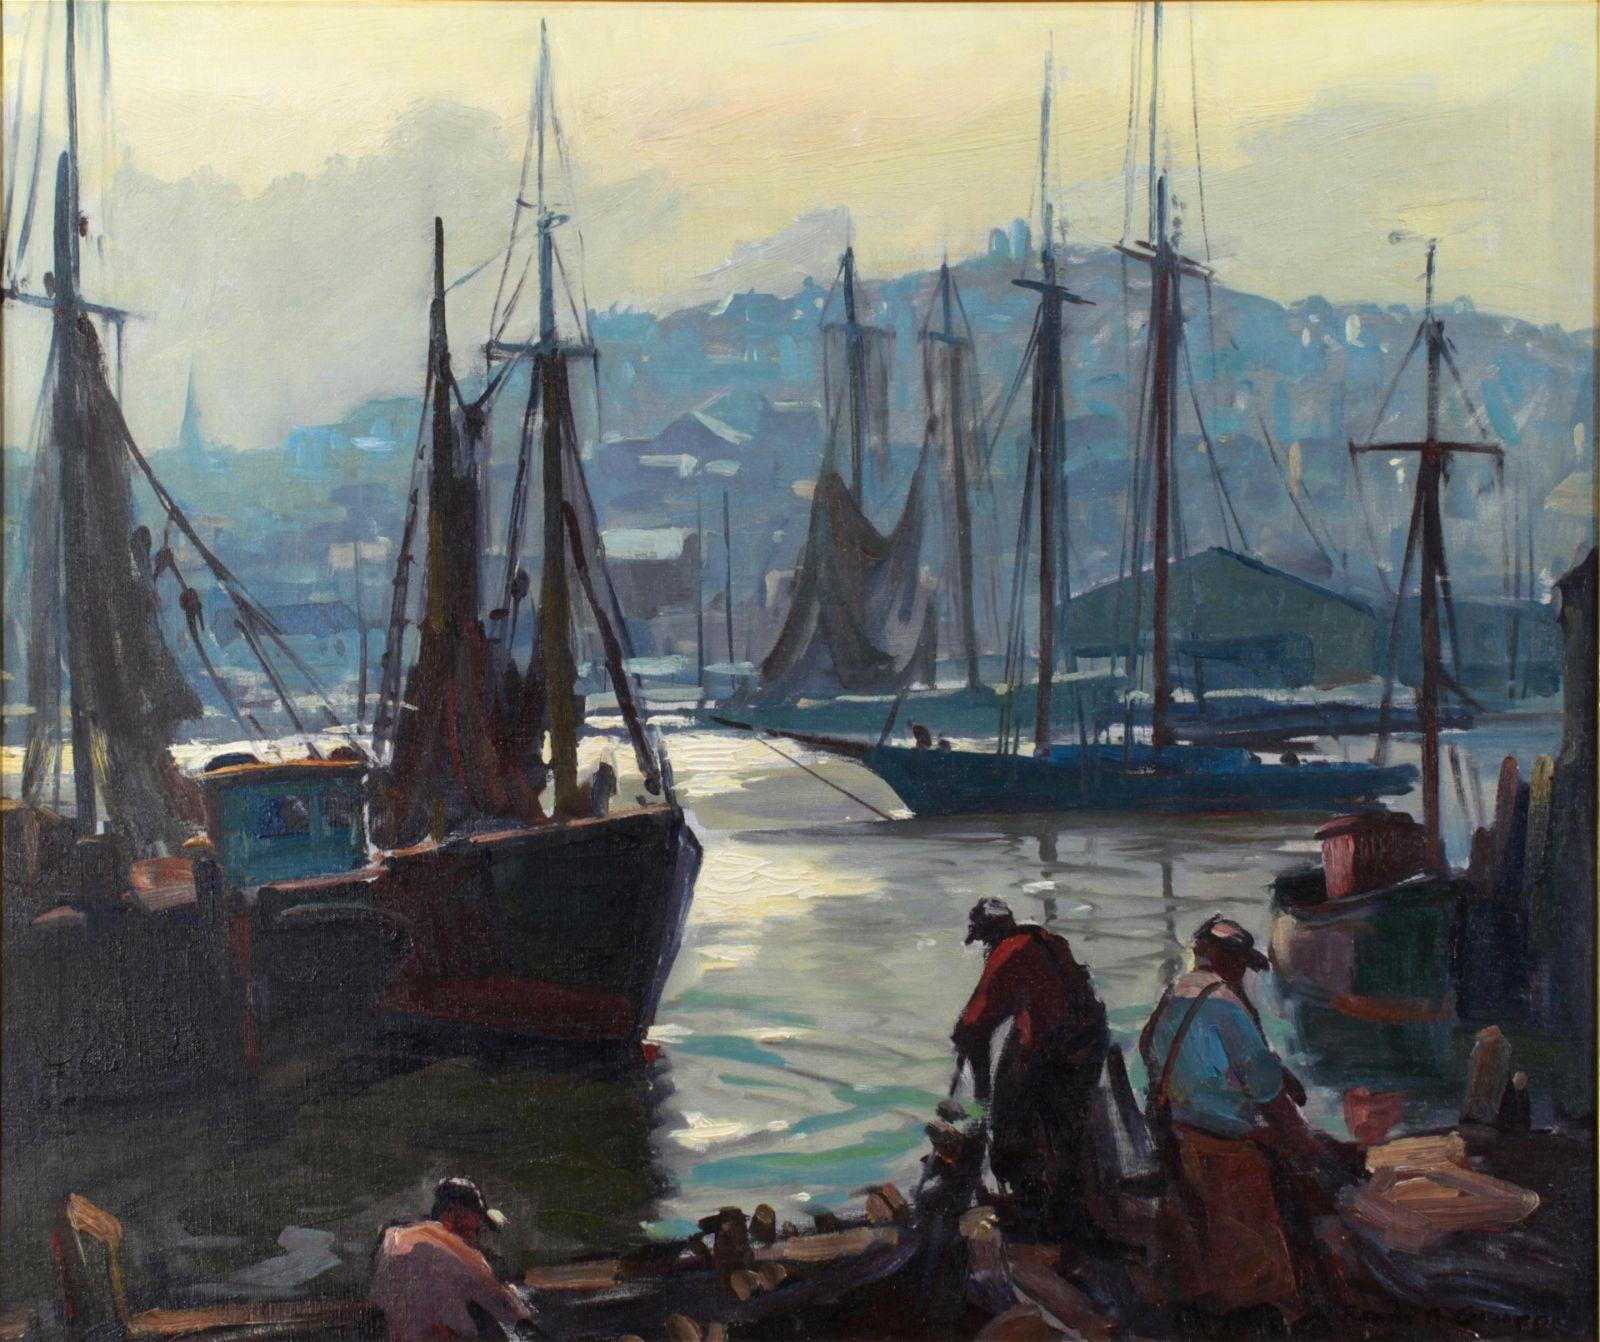 Painting, Emile Gruppe